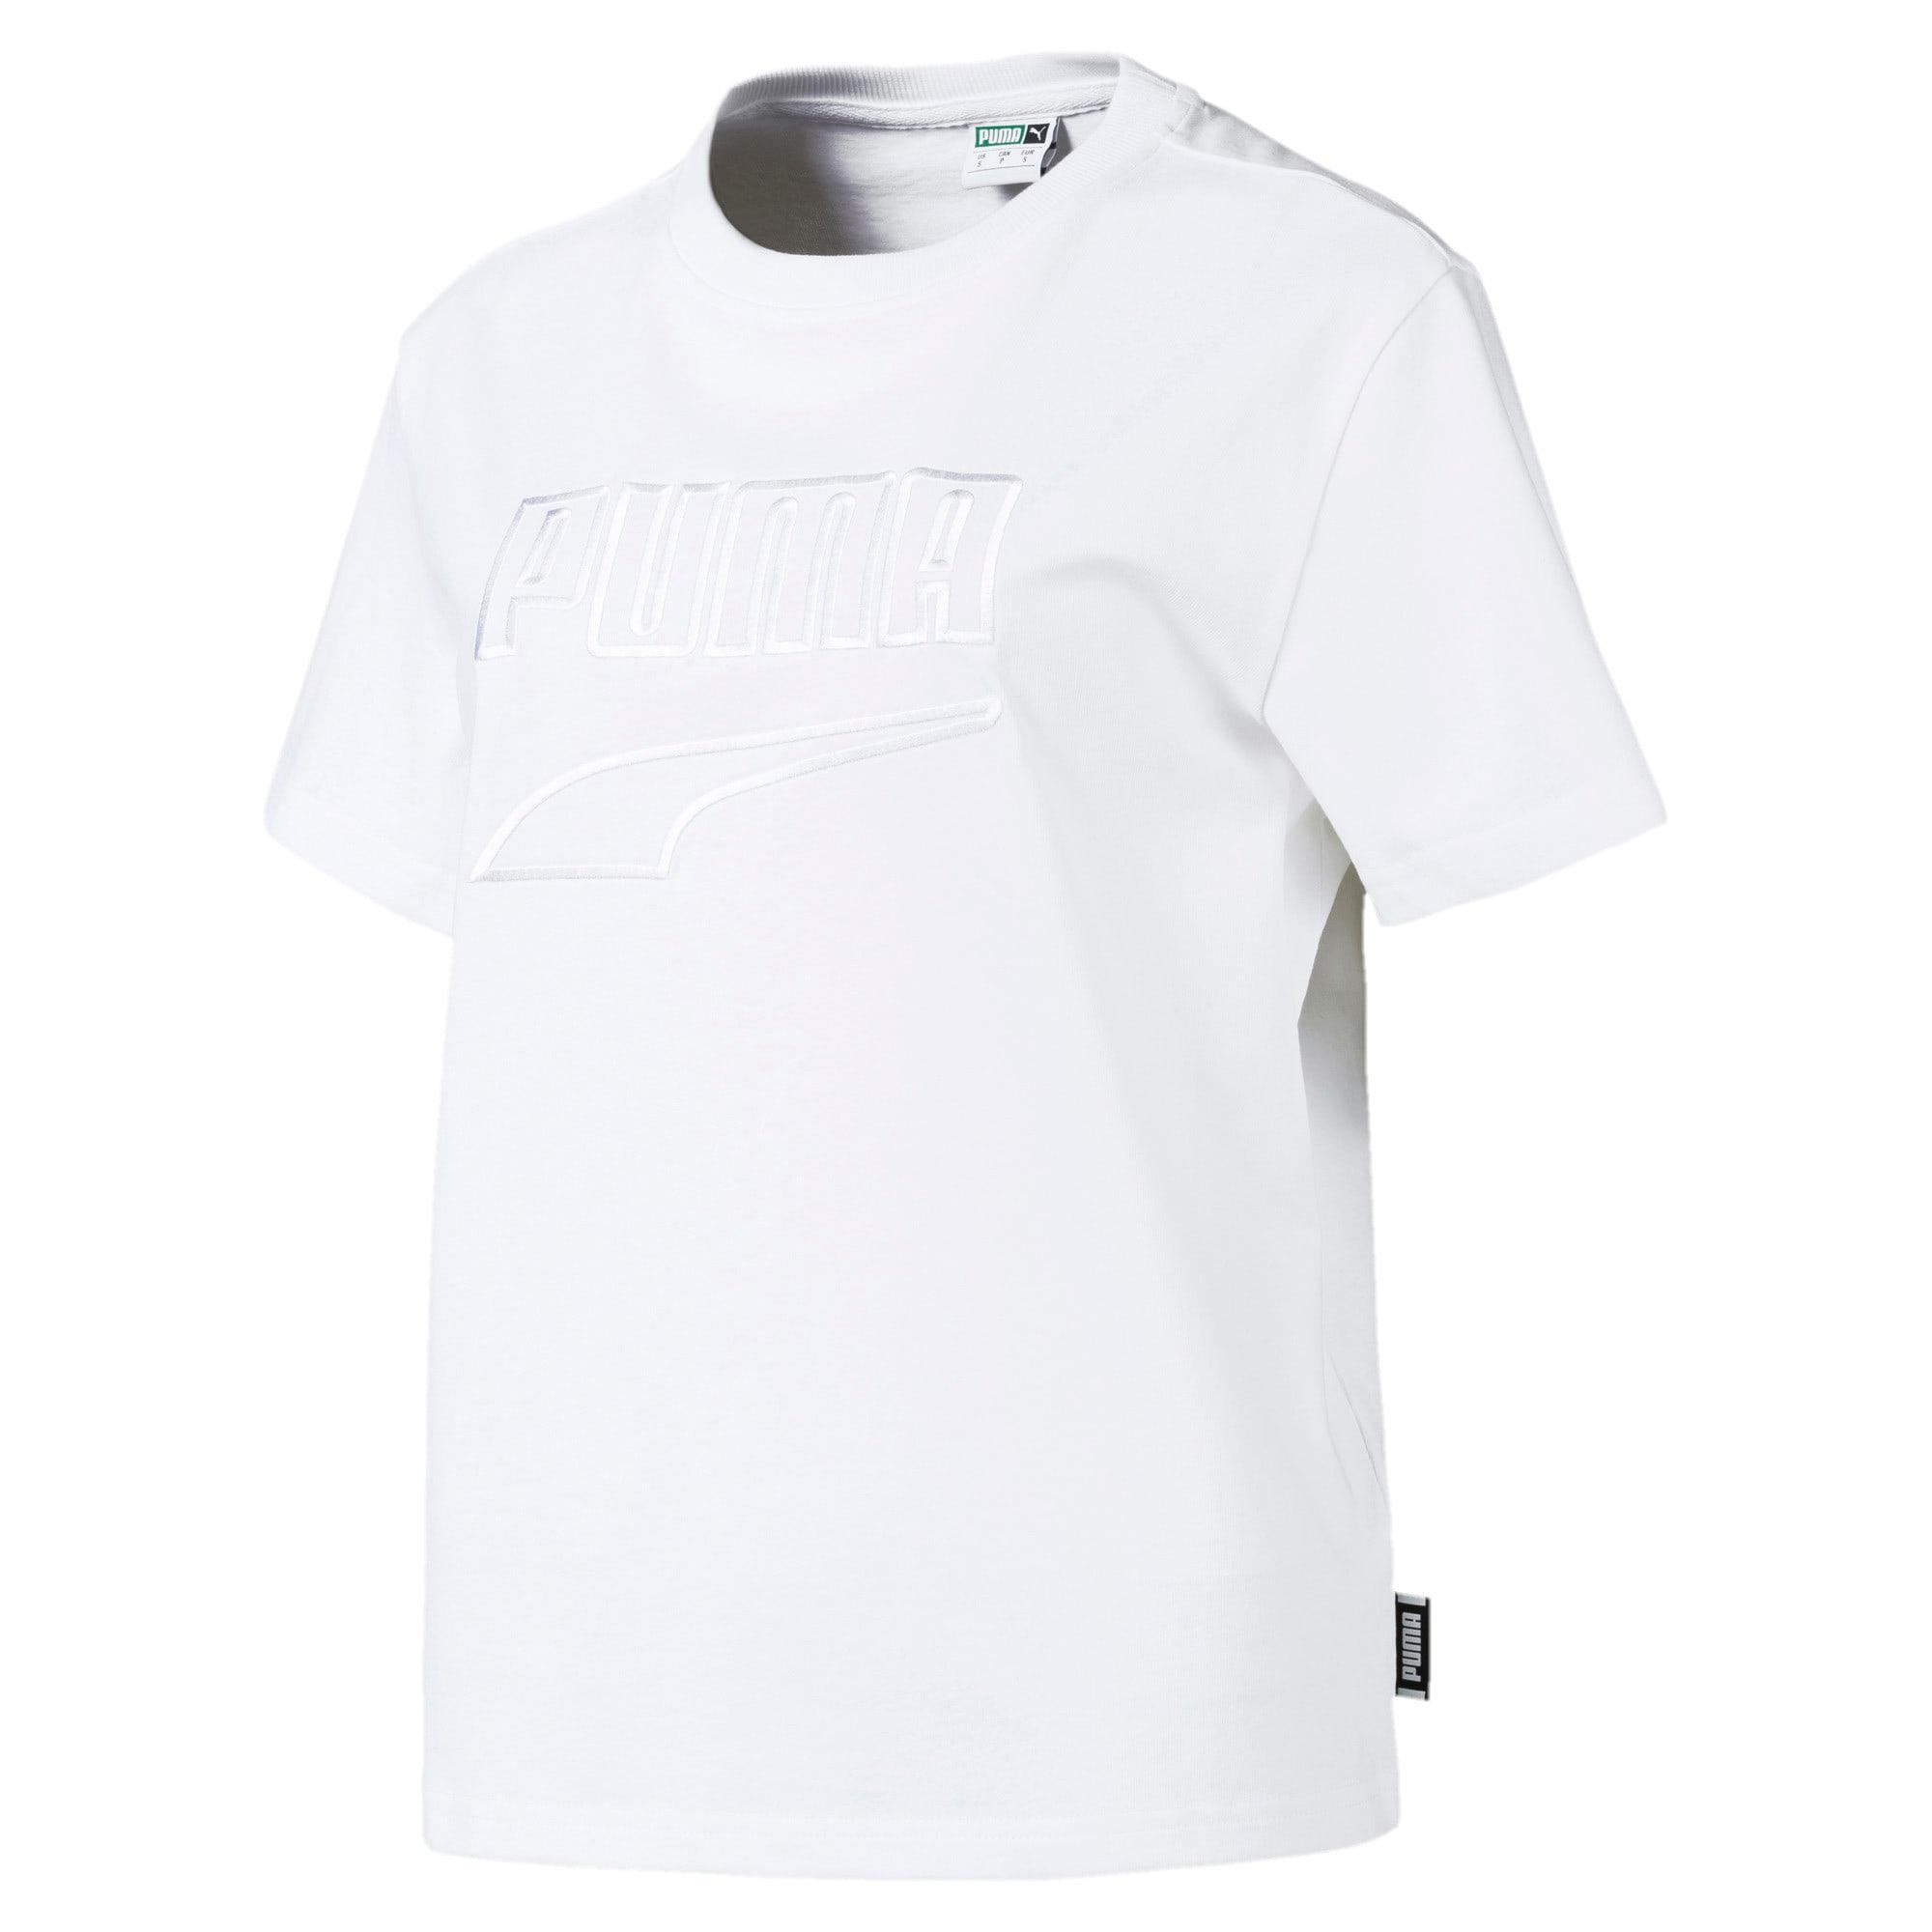 Miniatura 1 de CamisetaDowntown para mujer, Puma White, mediano